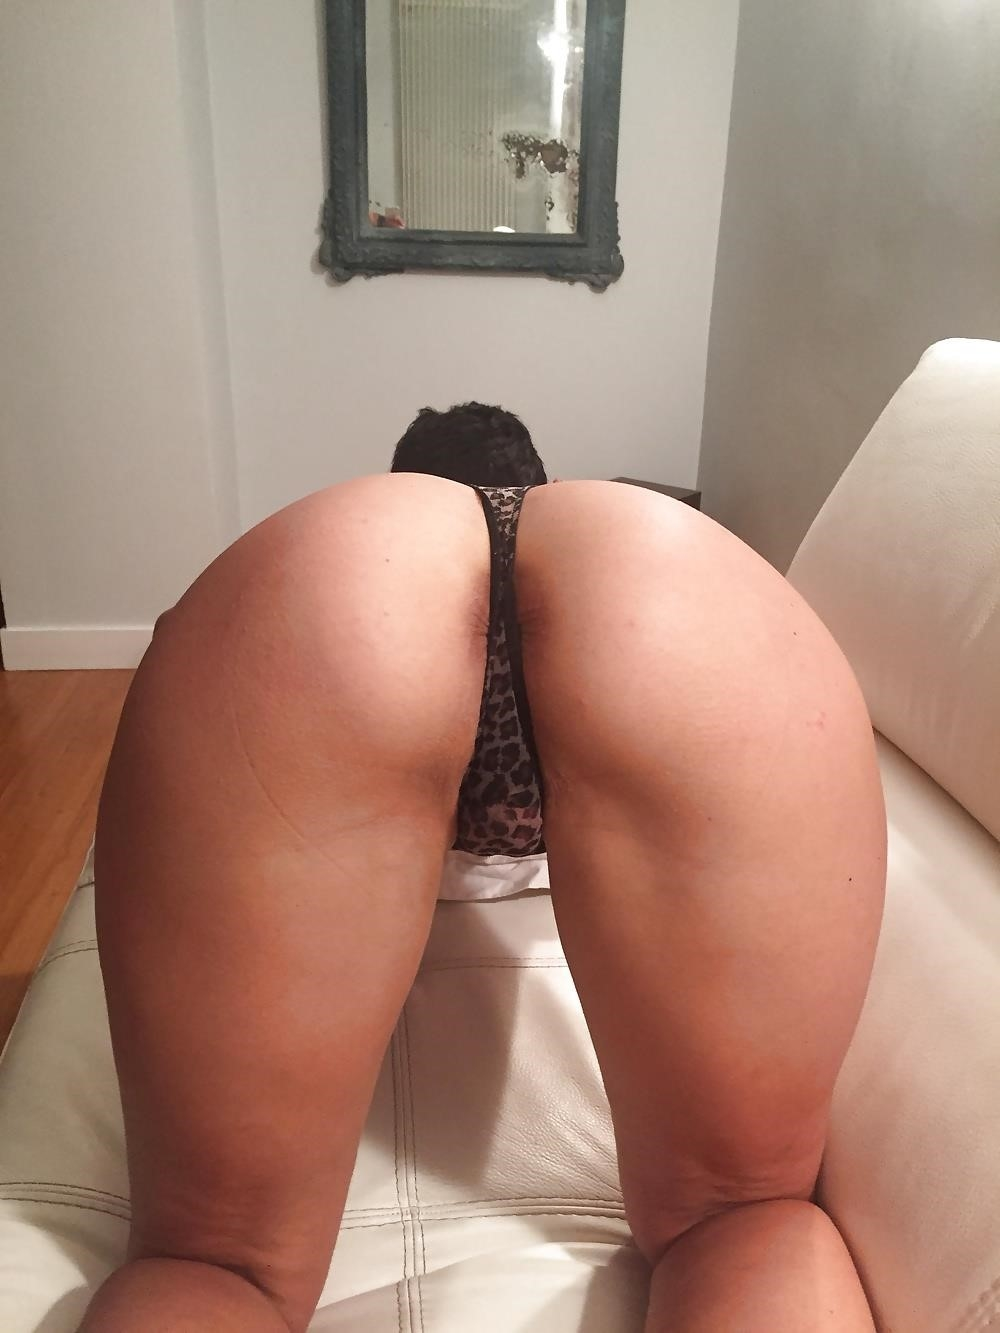 Hard anal fisting porn-2881